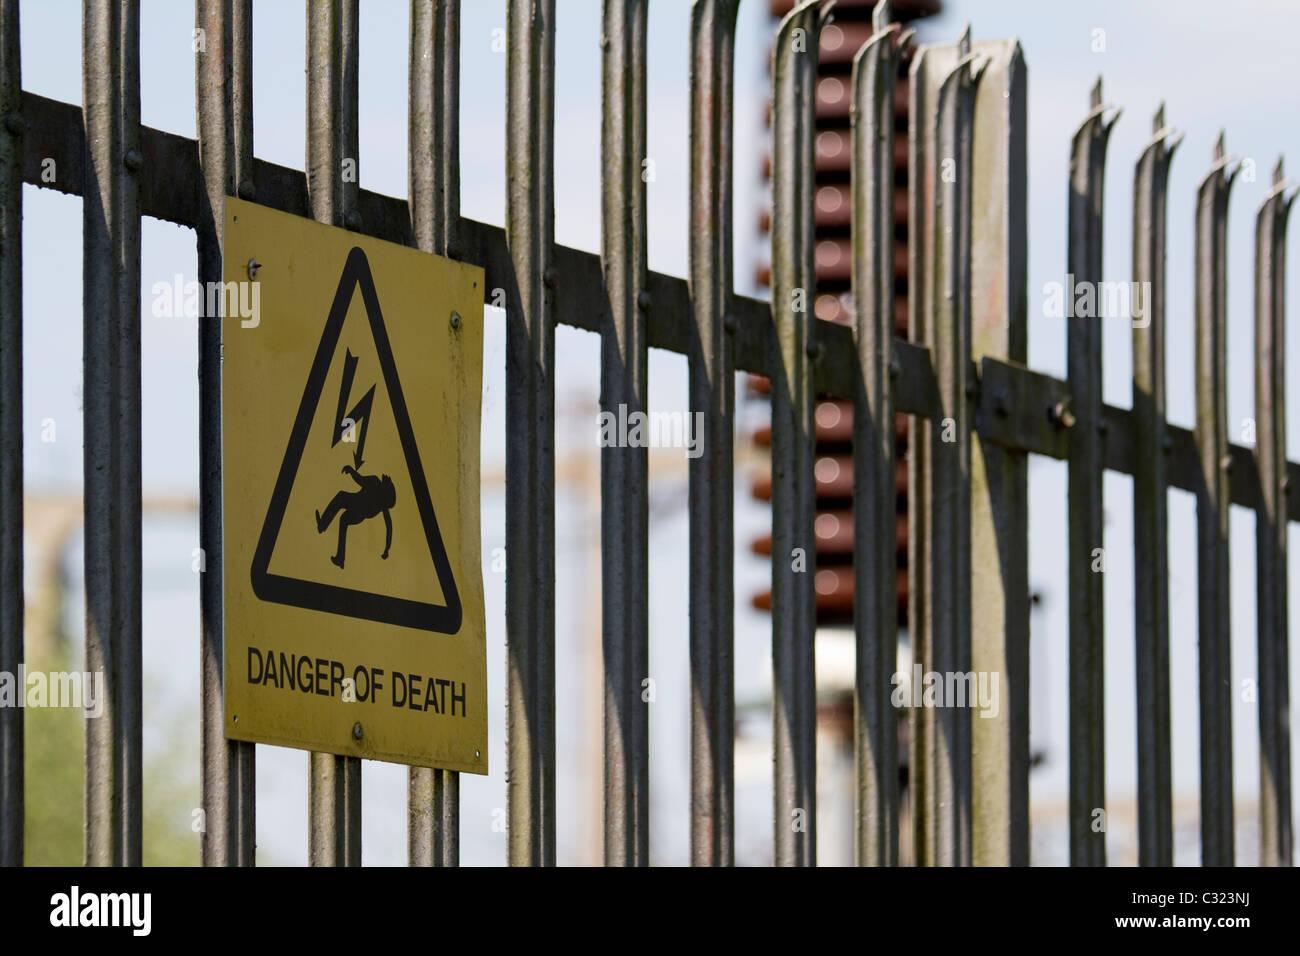 Electricity Sign Stockfotos & Electricity Sign Bilder - Alamy